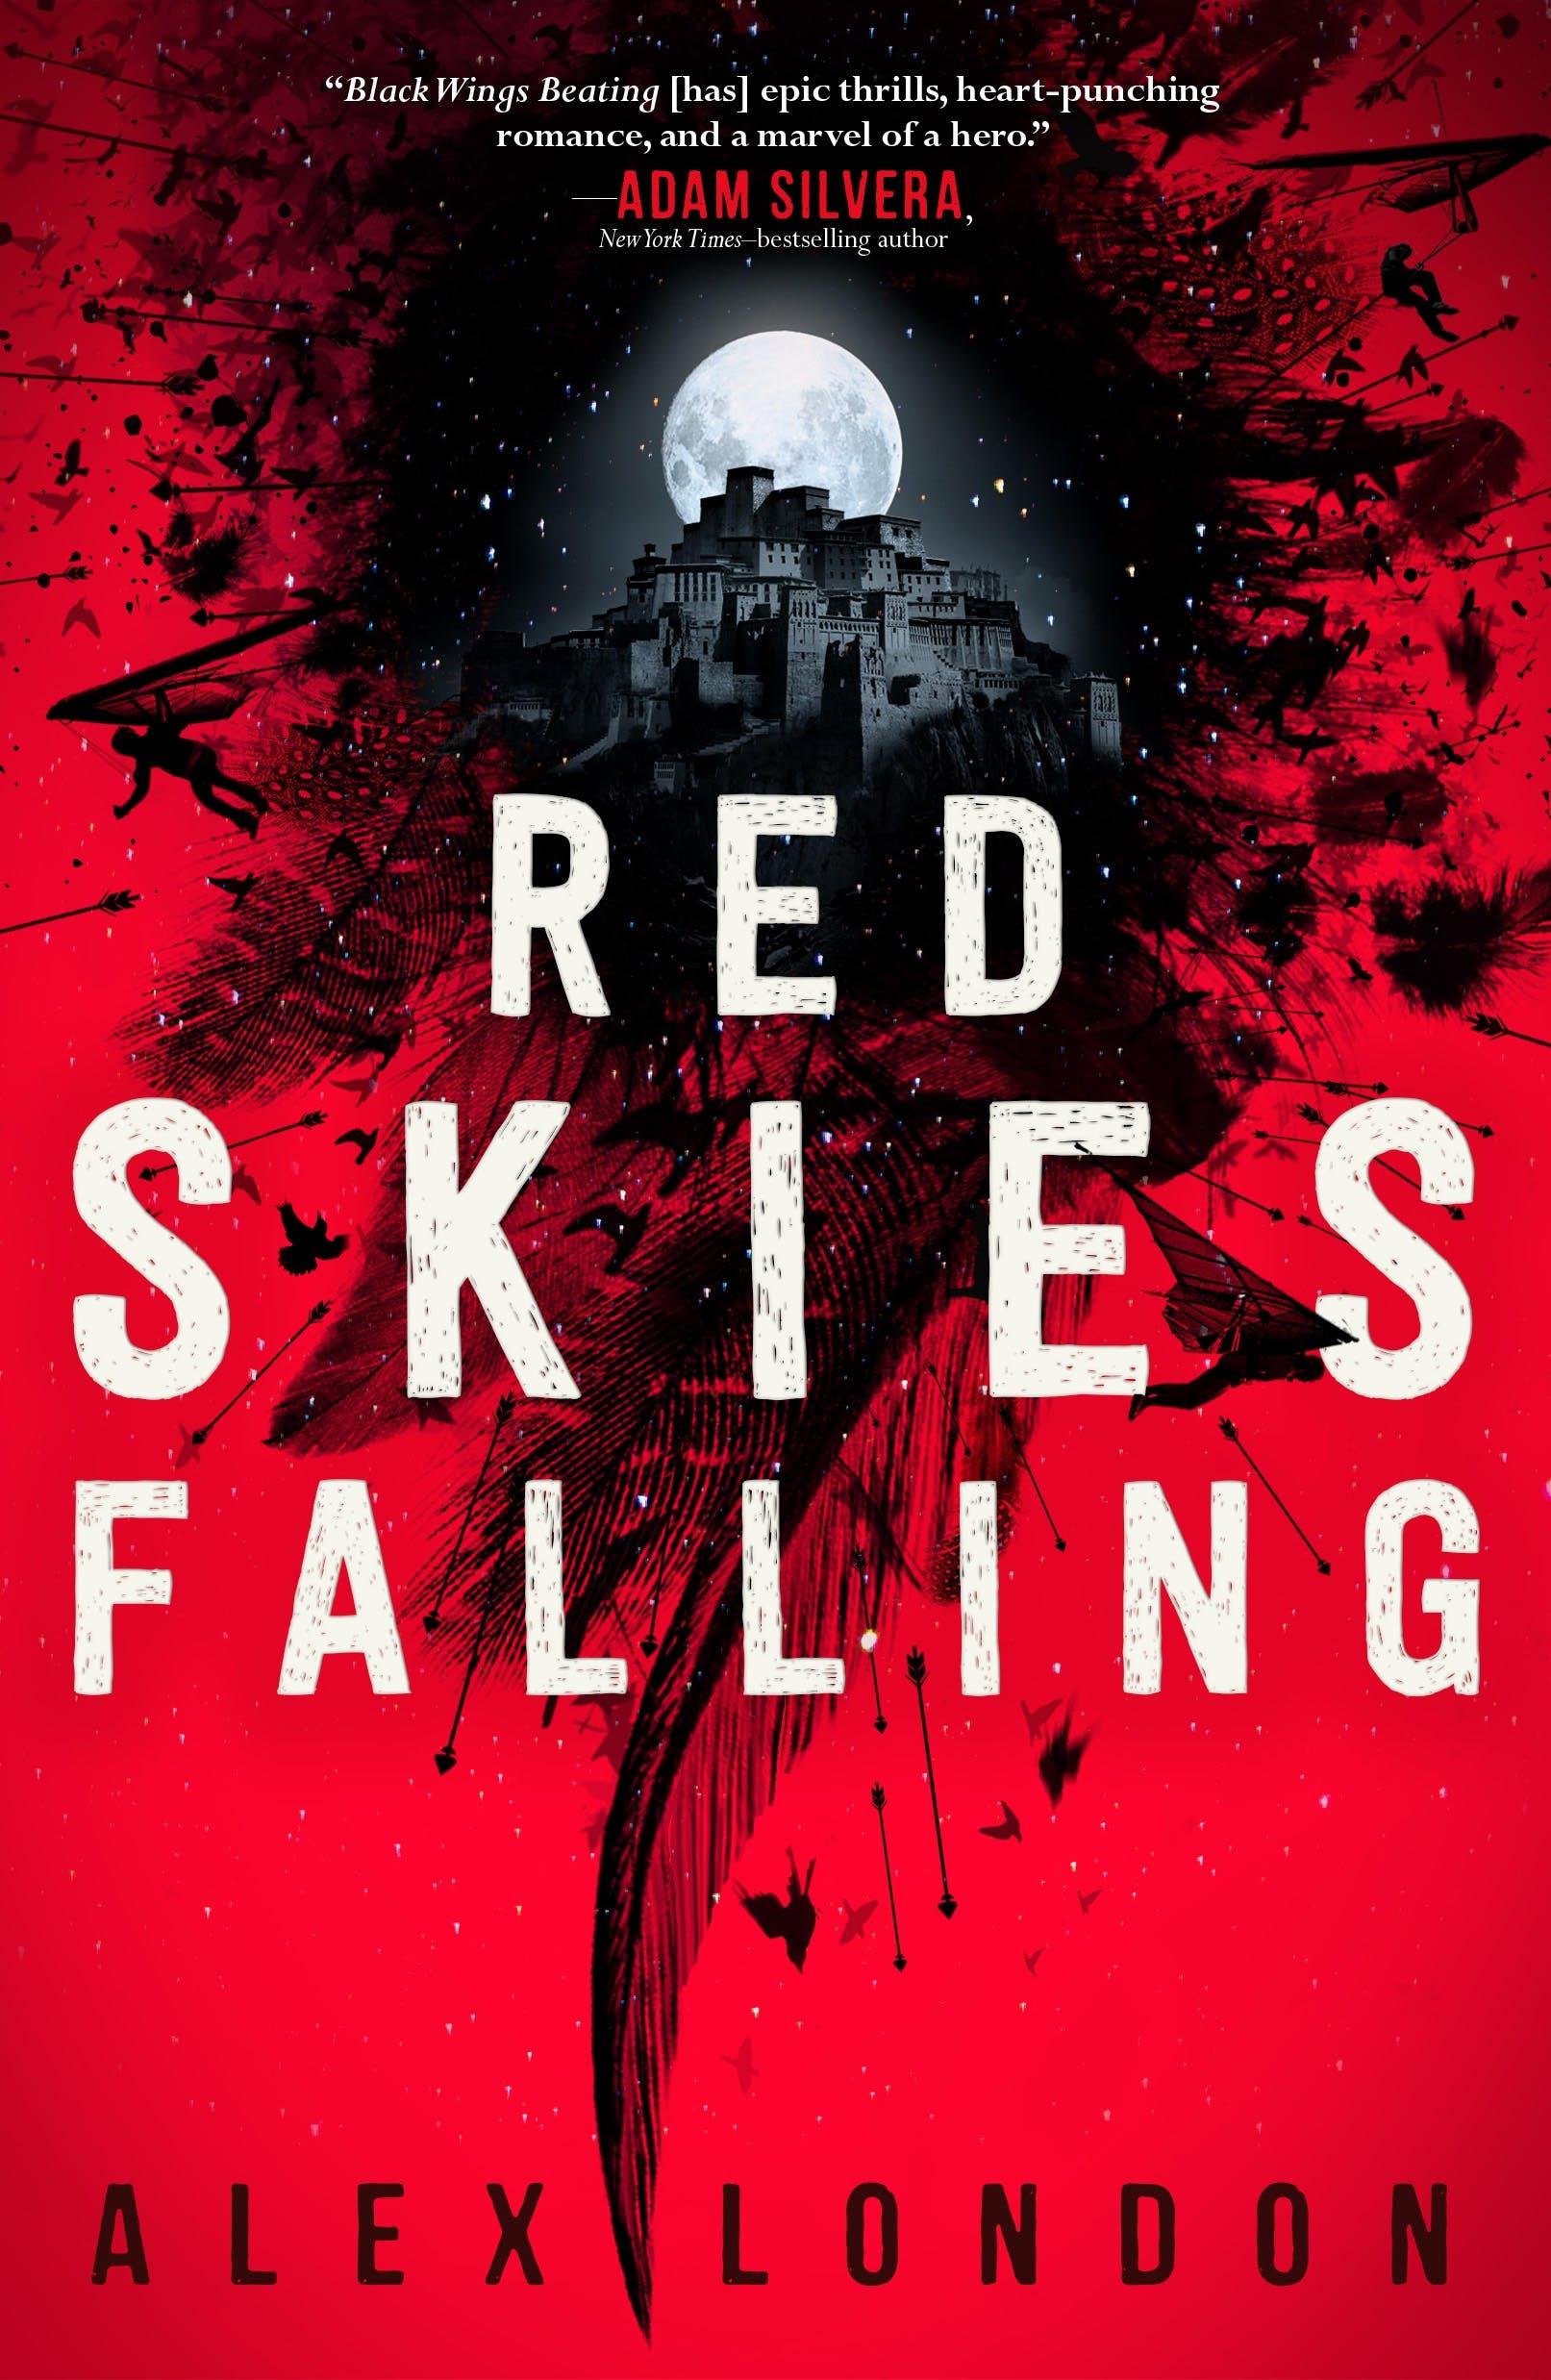 Image of Red Skies Falling